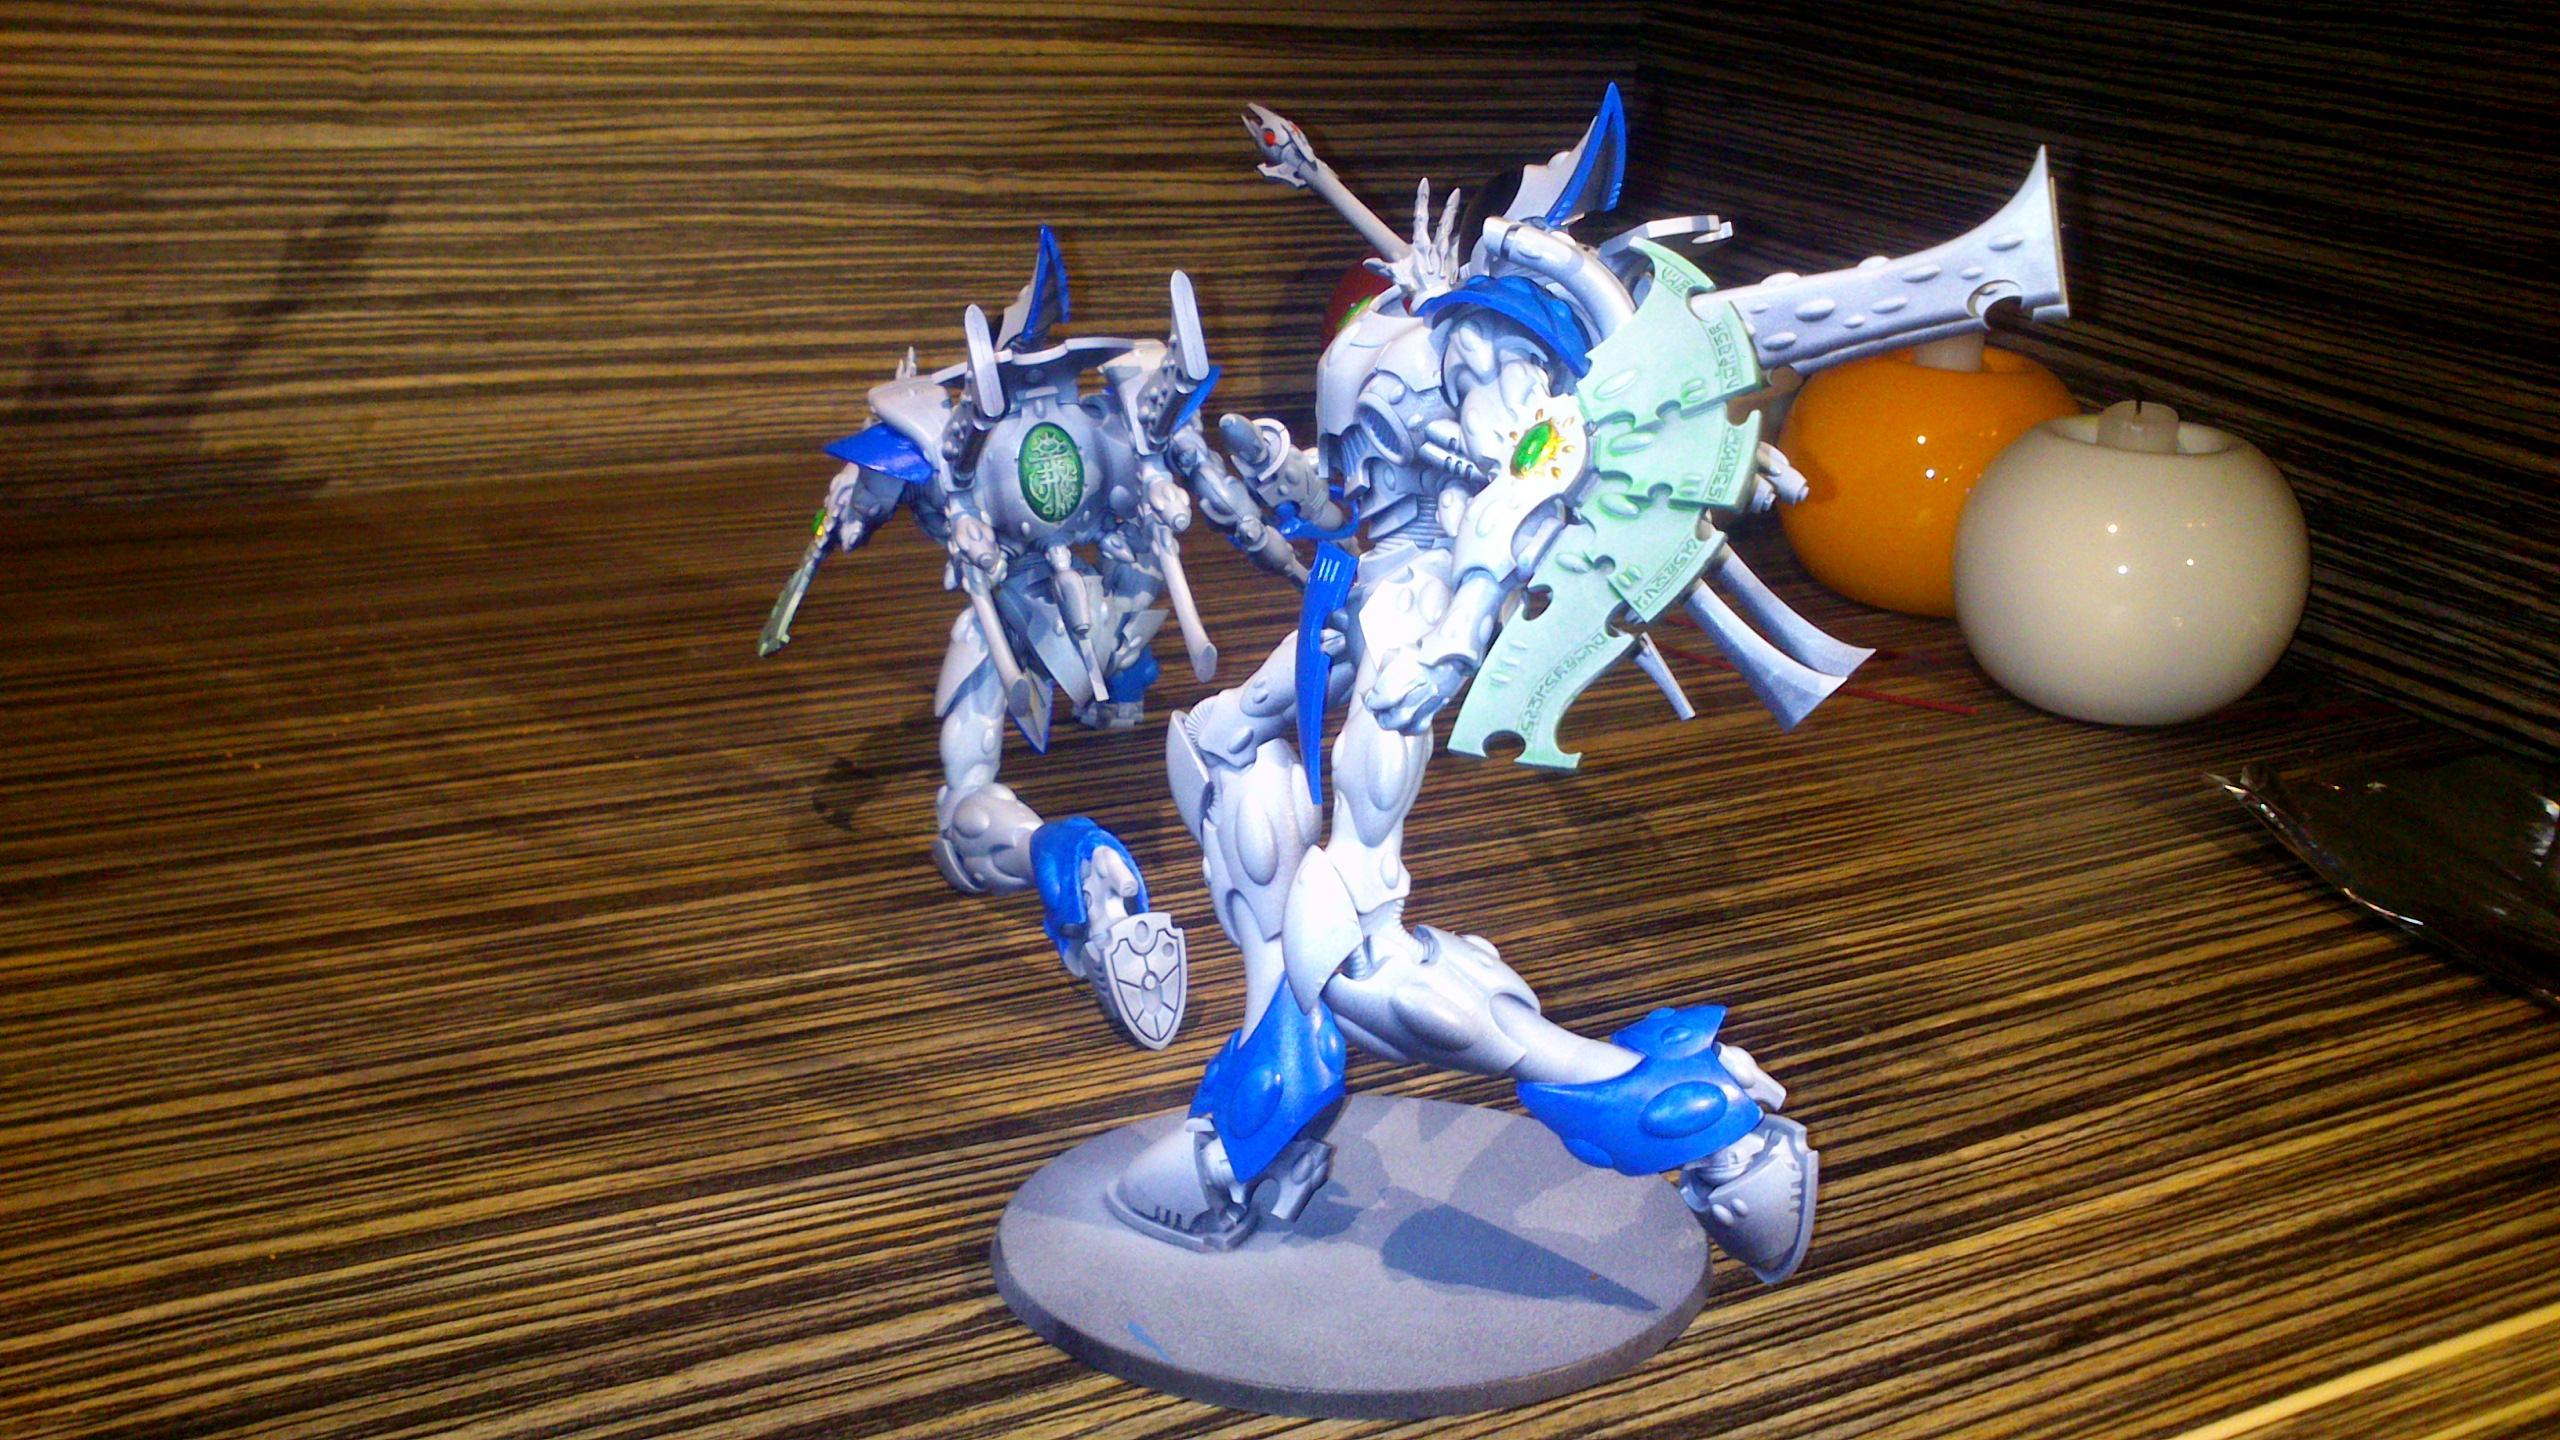 Blue, Blue White, Diorama, Eldar, Eldar Wraith Army, Force, Forest, Forge World, Ghost, Host, Ilyrith, Iyanden, Iybraesil, Kneel, Kneeling, Painting, Phoenix Lord, Pose, Posing, Run, Running, Scatterlaser, Shadow, Snow, Spectres, Spirit, Spirit Host, Spirit Only, Suncannon, Team, Warhammer 40,000, Warhammer Fantasy, Waveserpent, White, Winter, Wraith, Wraith Host, Wraith Only, Wraithguard, Wraithknight, Wraithknights, Wraithlord